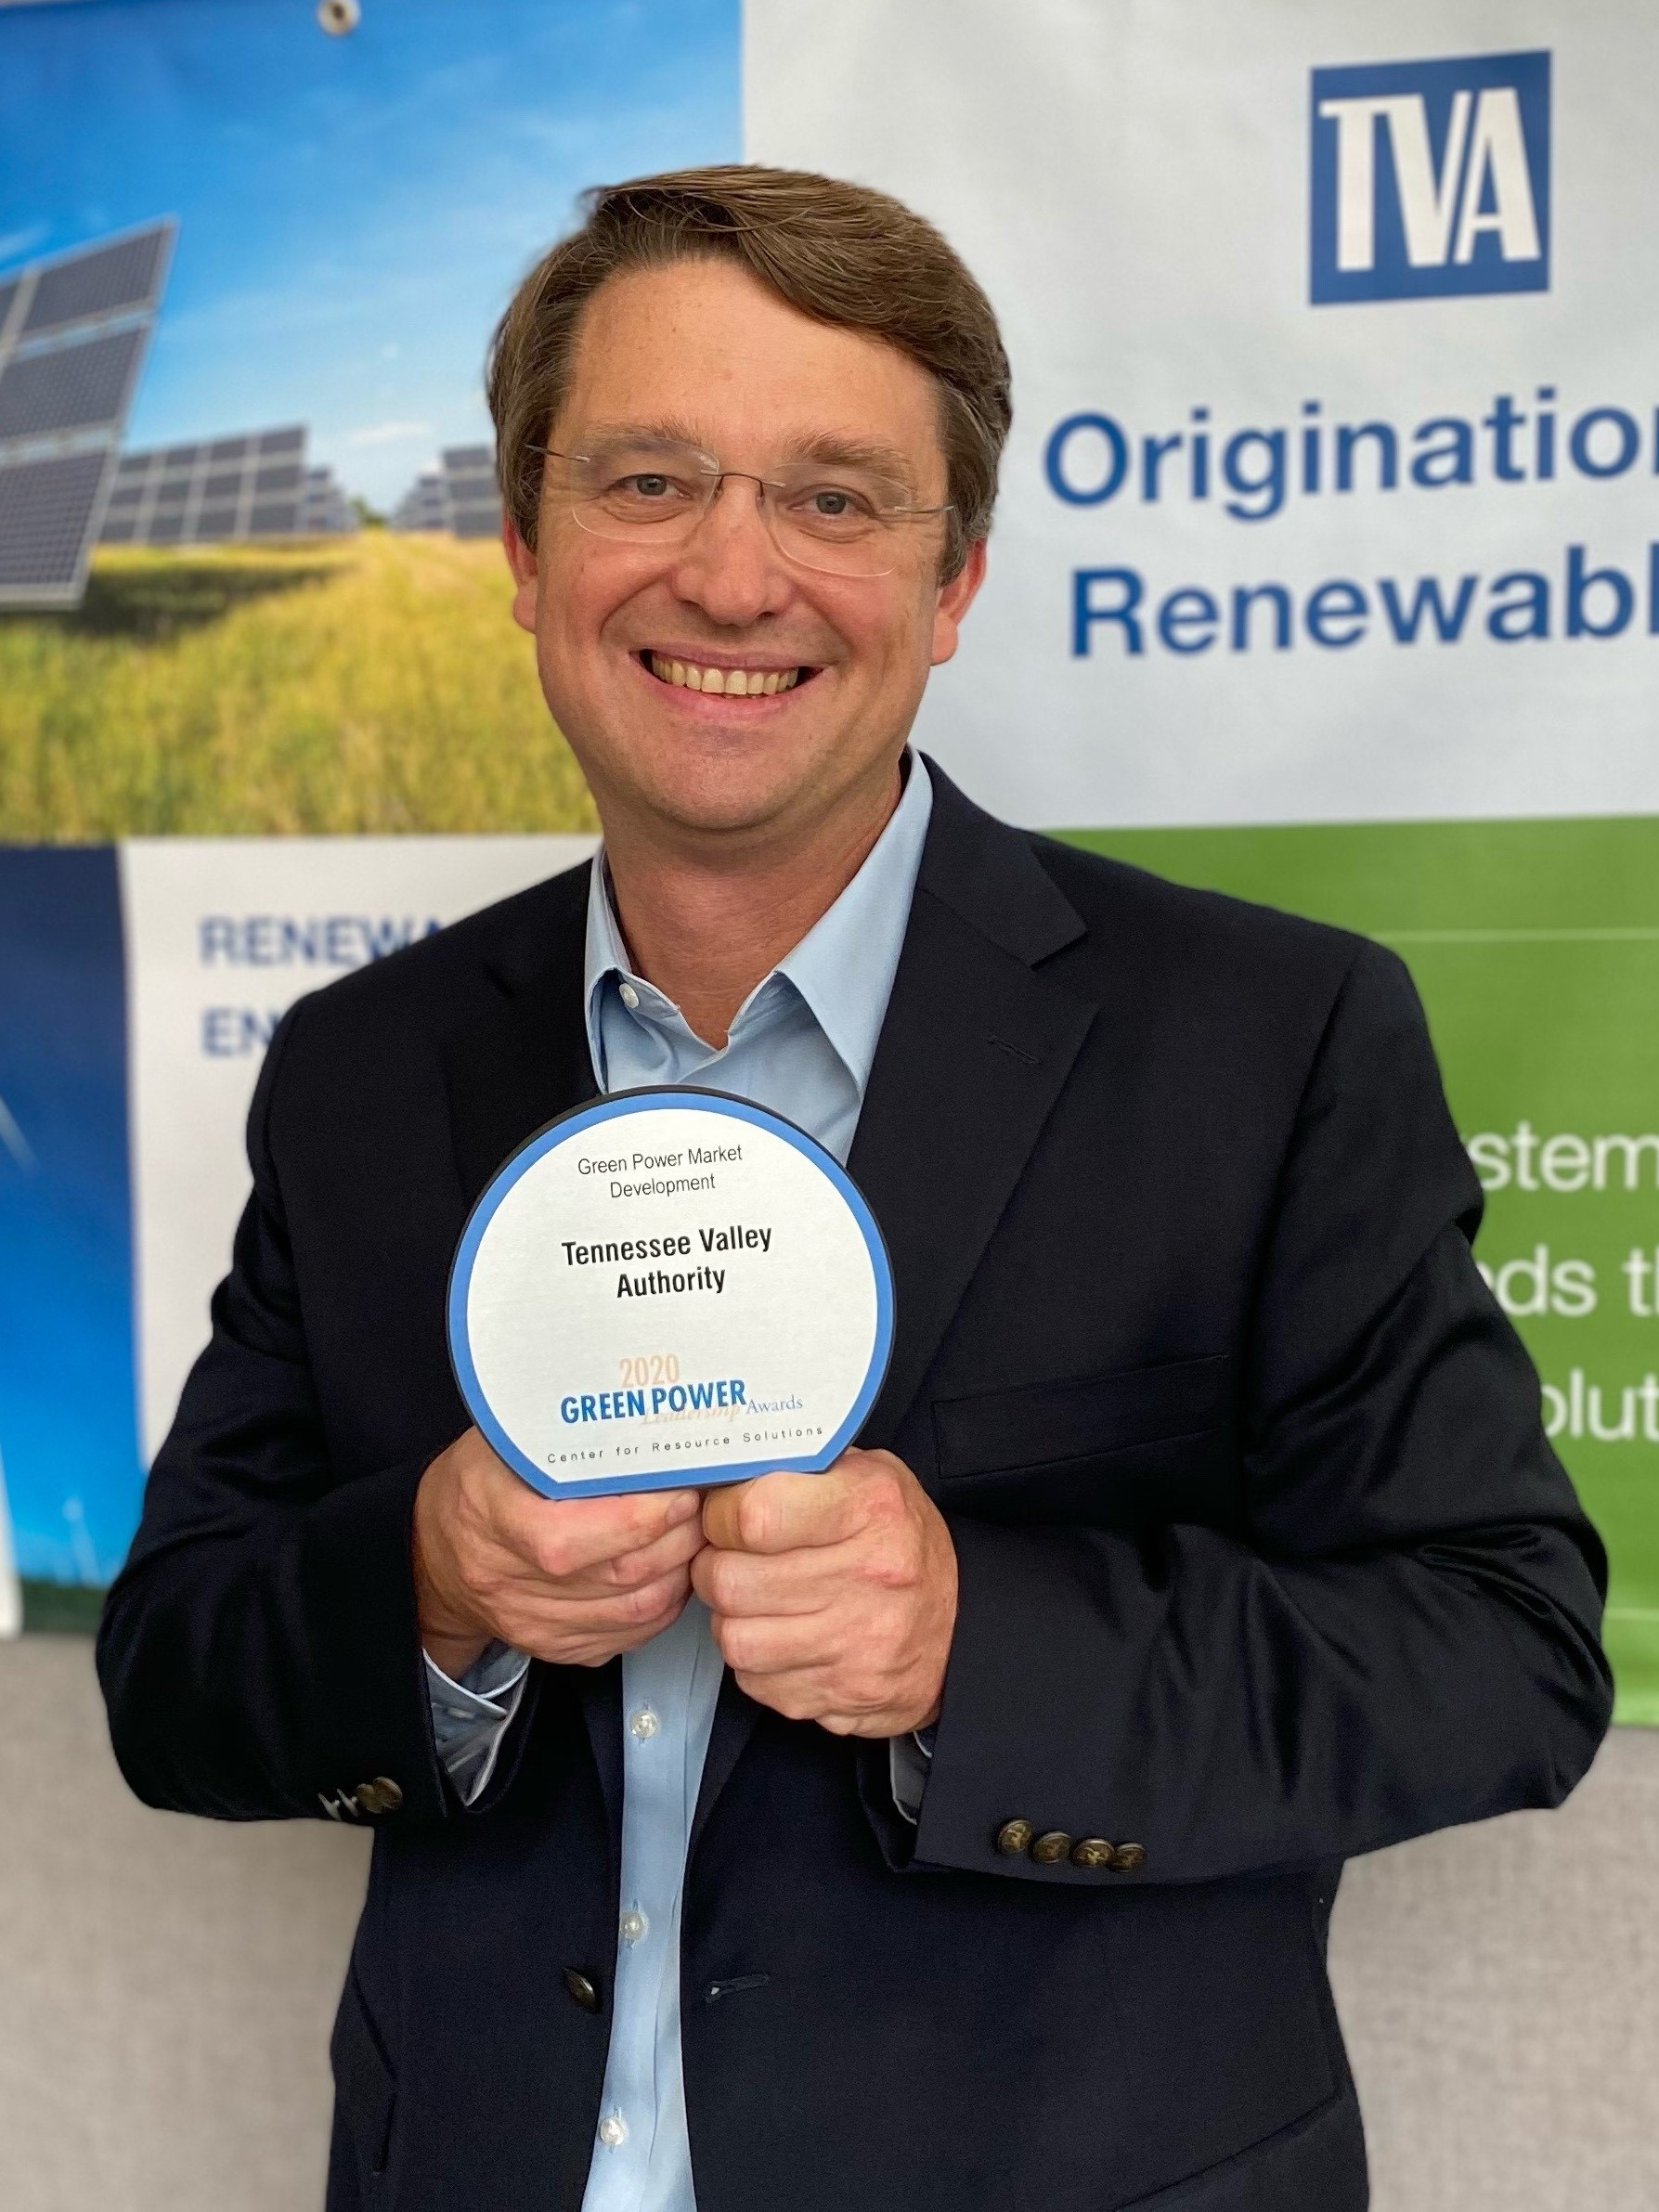 Chris_Hansen EPA Award